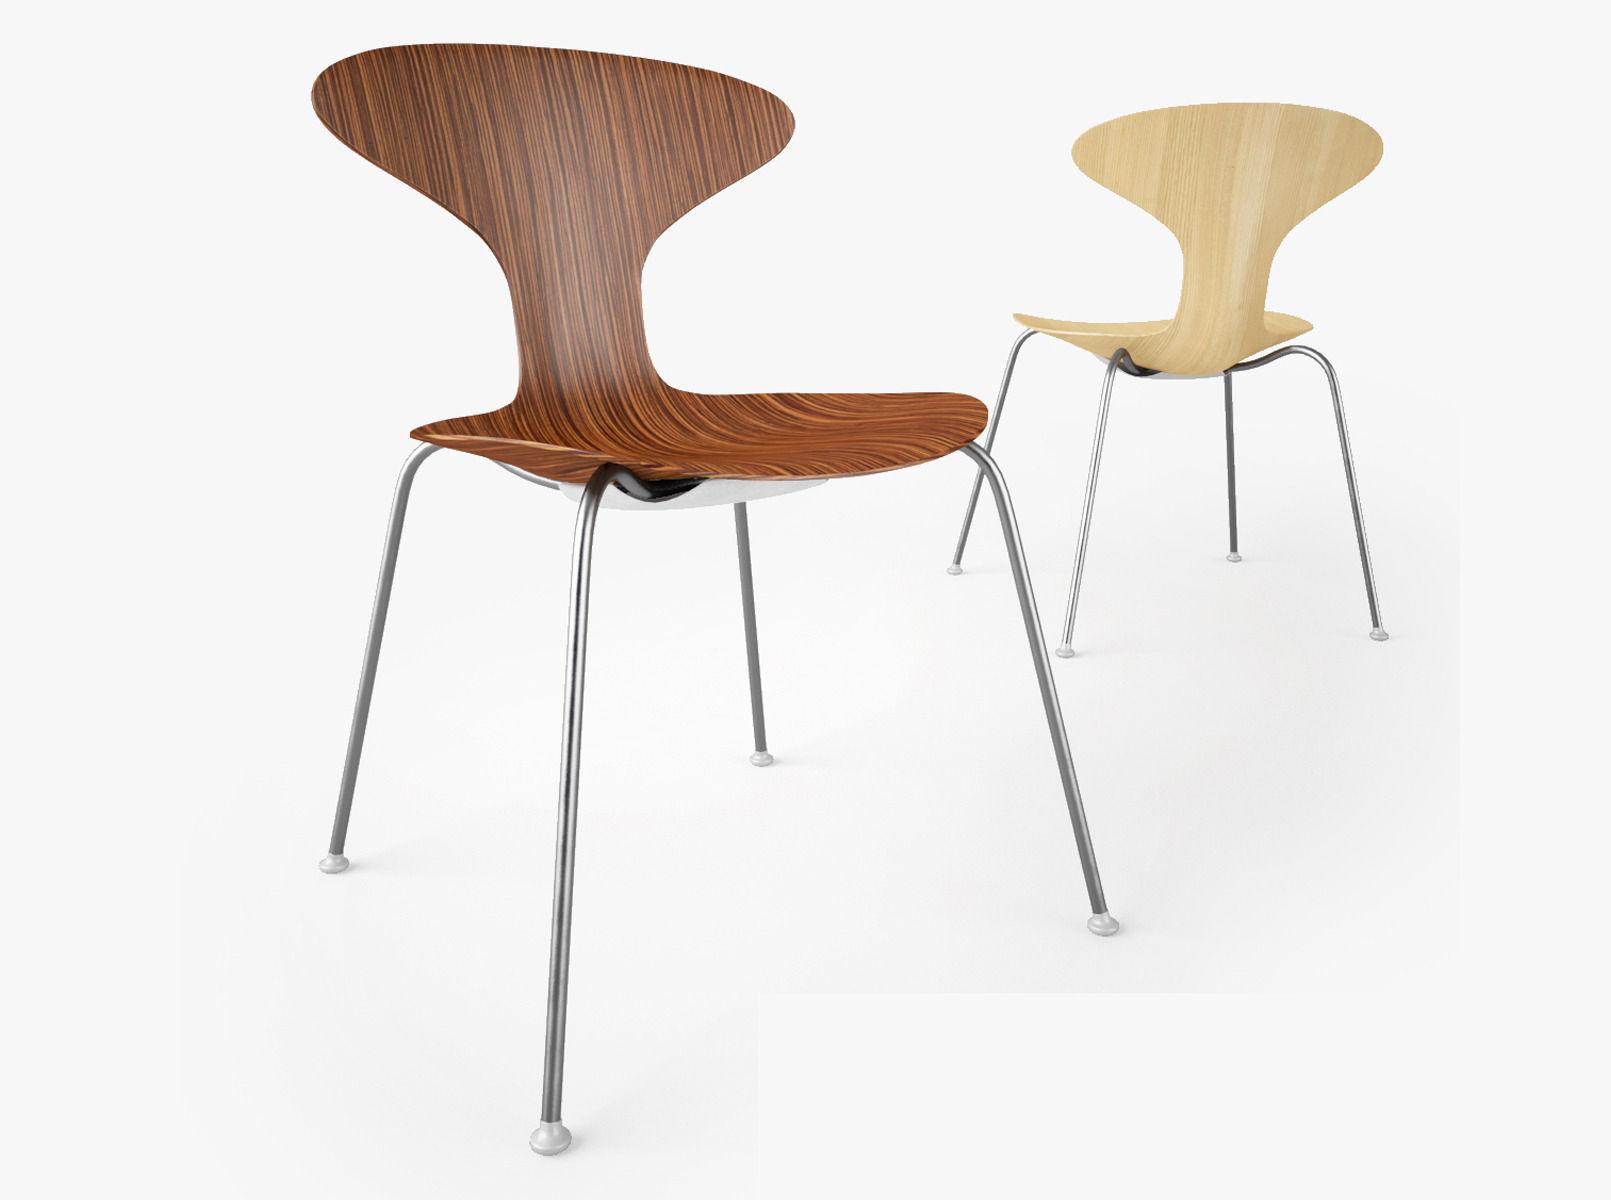 Bernhardt Design Orbit Wood Chair 3d Model Max Obj Fbx Mtl 1 ...